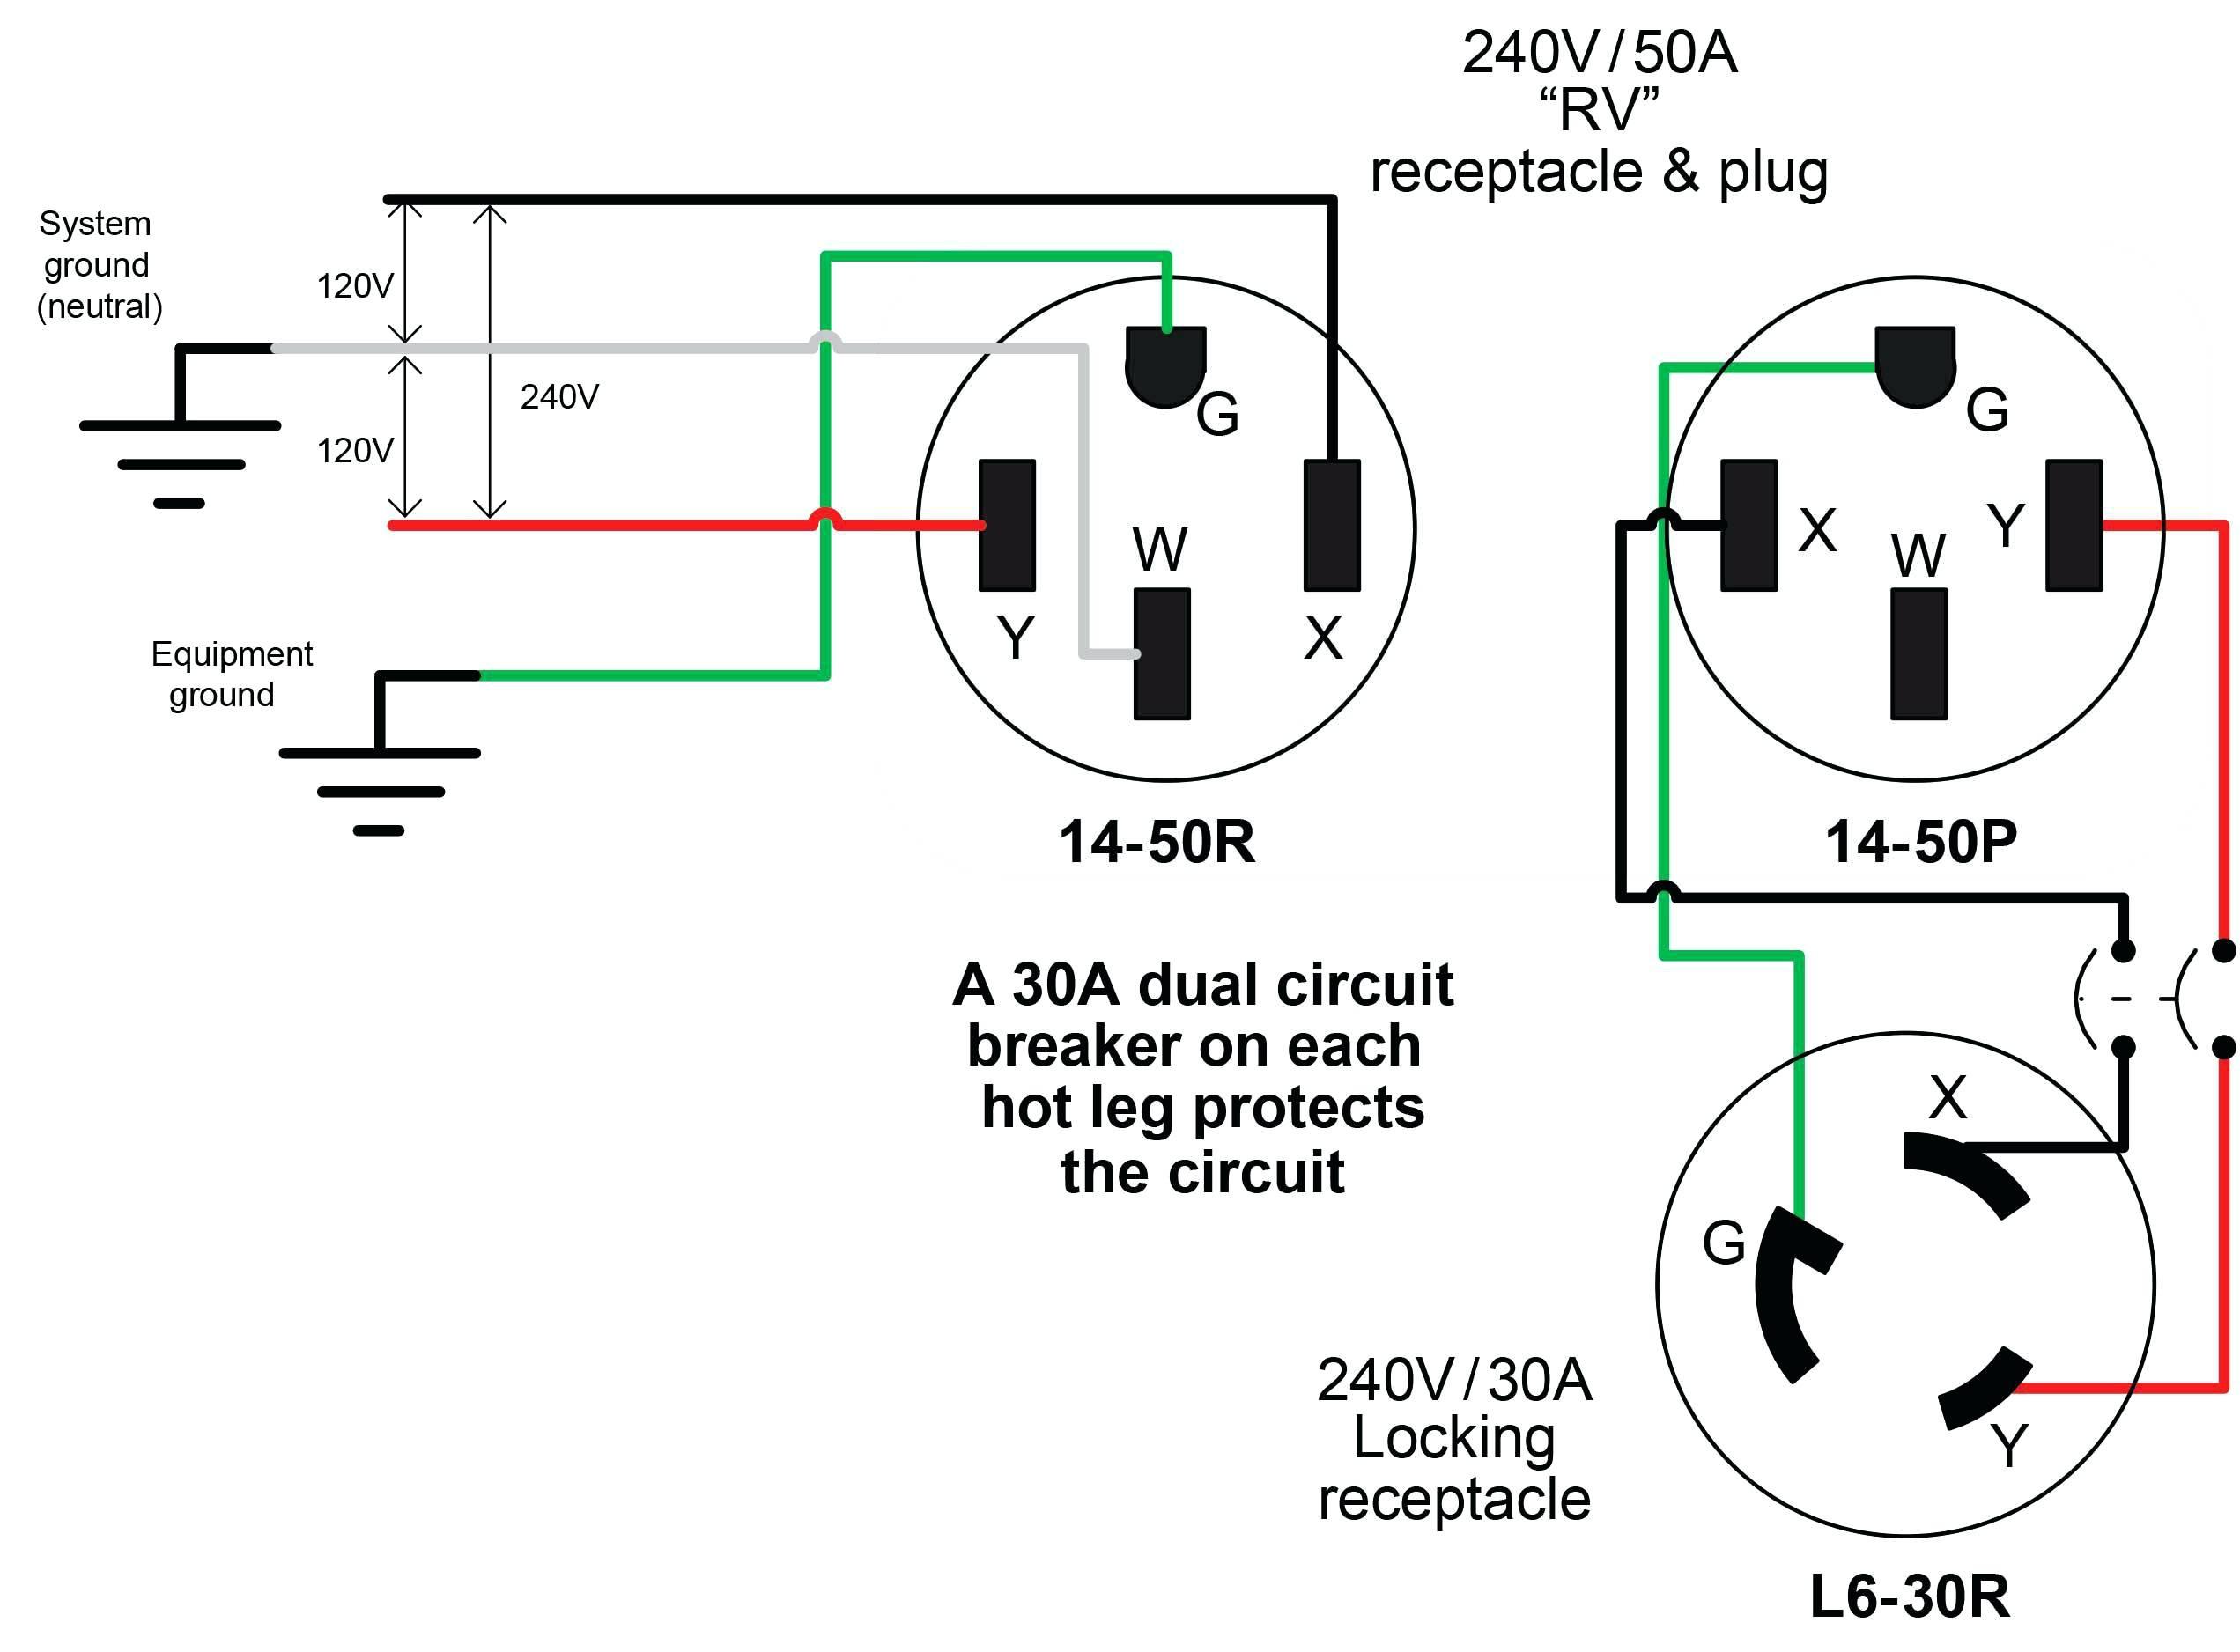 nema 14 20r wiring diagram Download-Nema Wiring Diagram Symbols Fresh Nema 14 50r Wiring Diagram 12-p